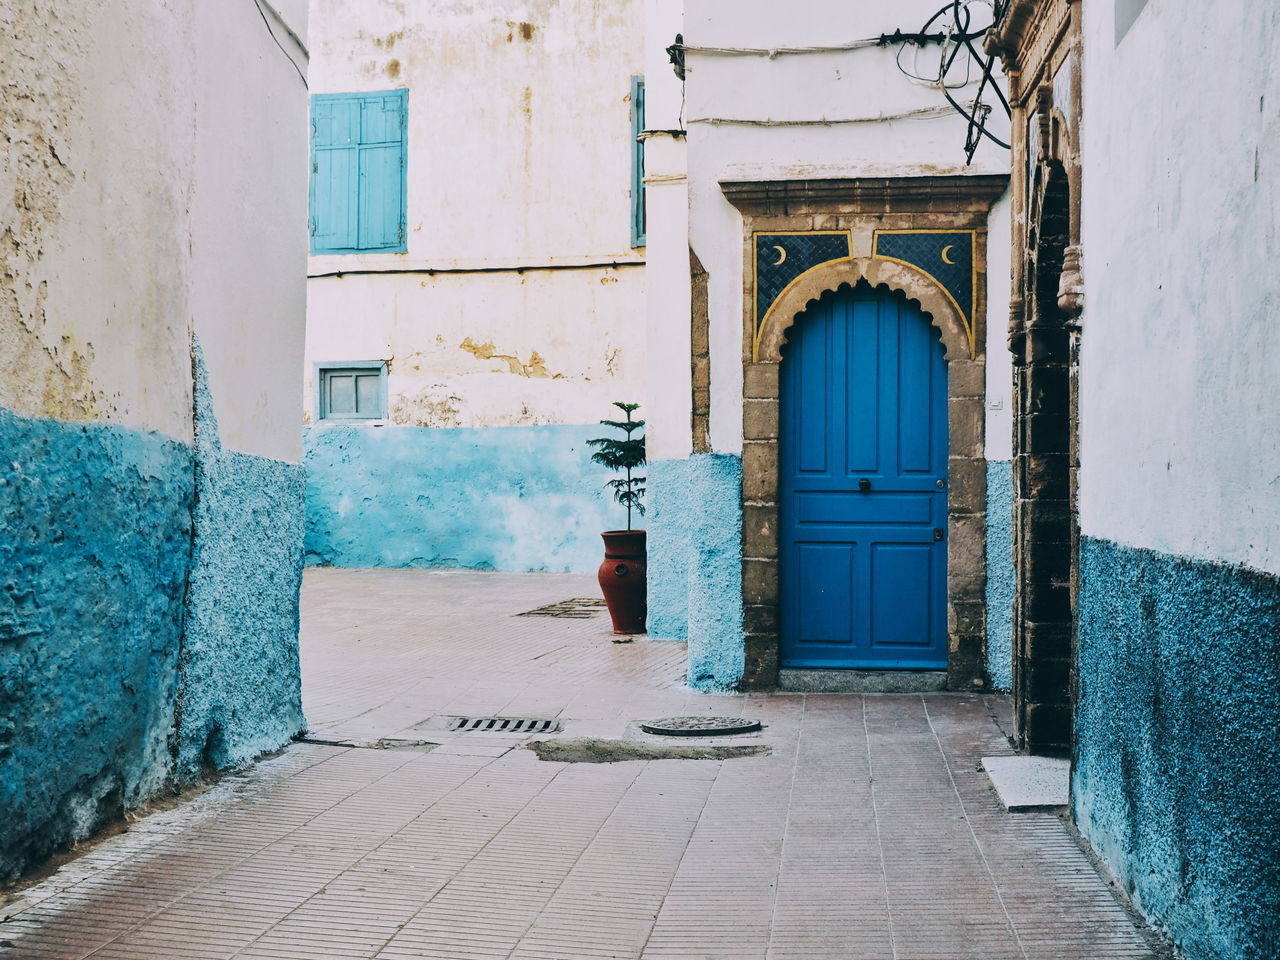 Architecture Built Structure Door Travel Destinations Building Exterior Arch Day No People Outdoors Blue Blue Paint Blue Painted Surface Architecture Art Deco Pastel Colors Pastel Colours Old Town Pretty City Old Architecture Essaouira Morocco Morocco 🇲🇦